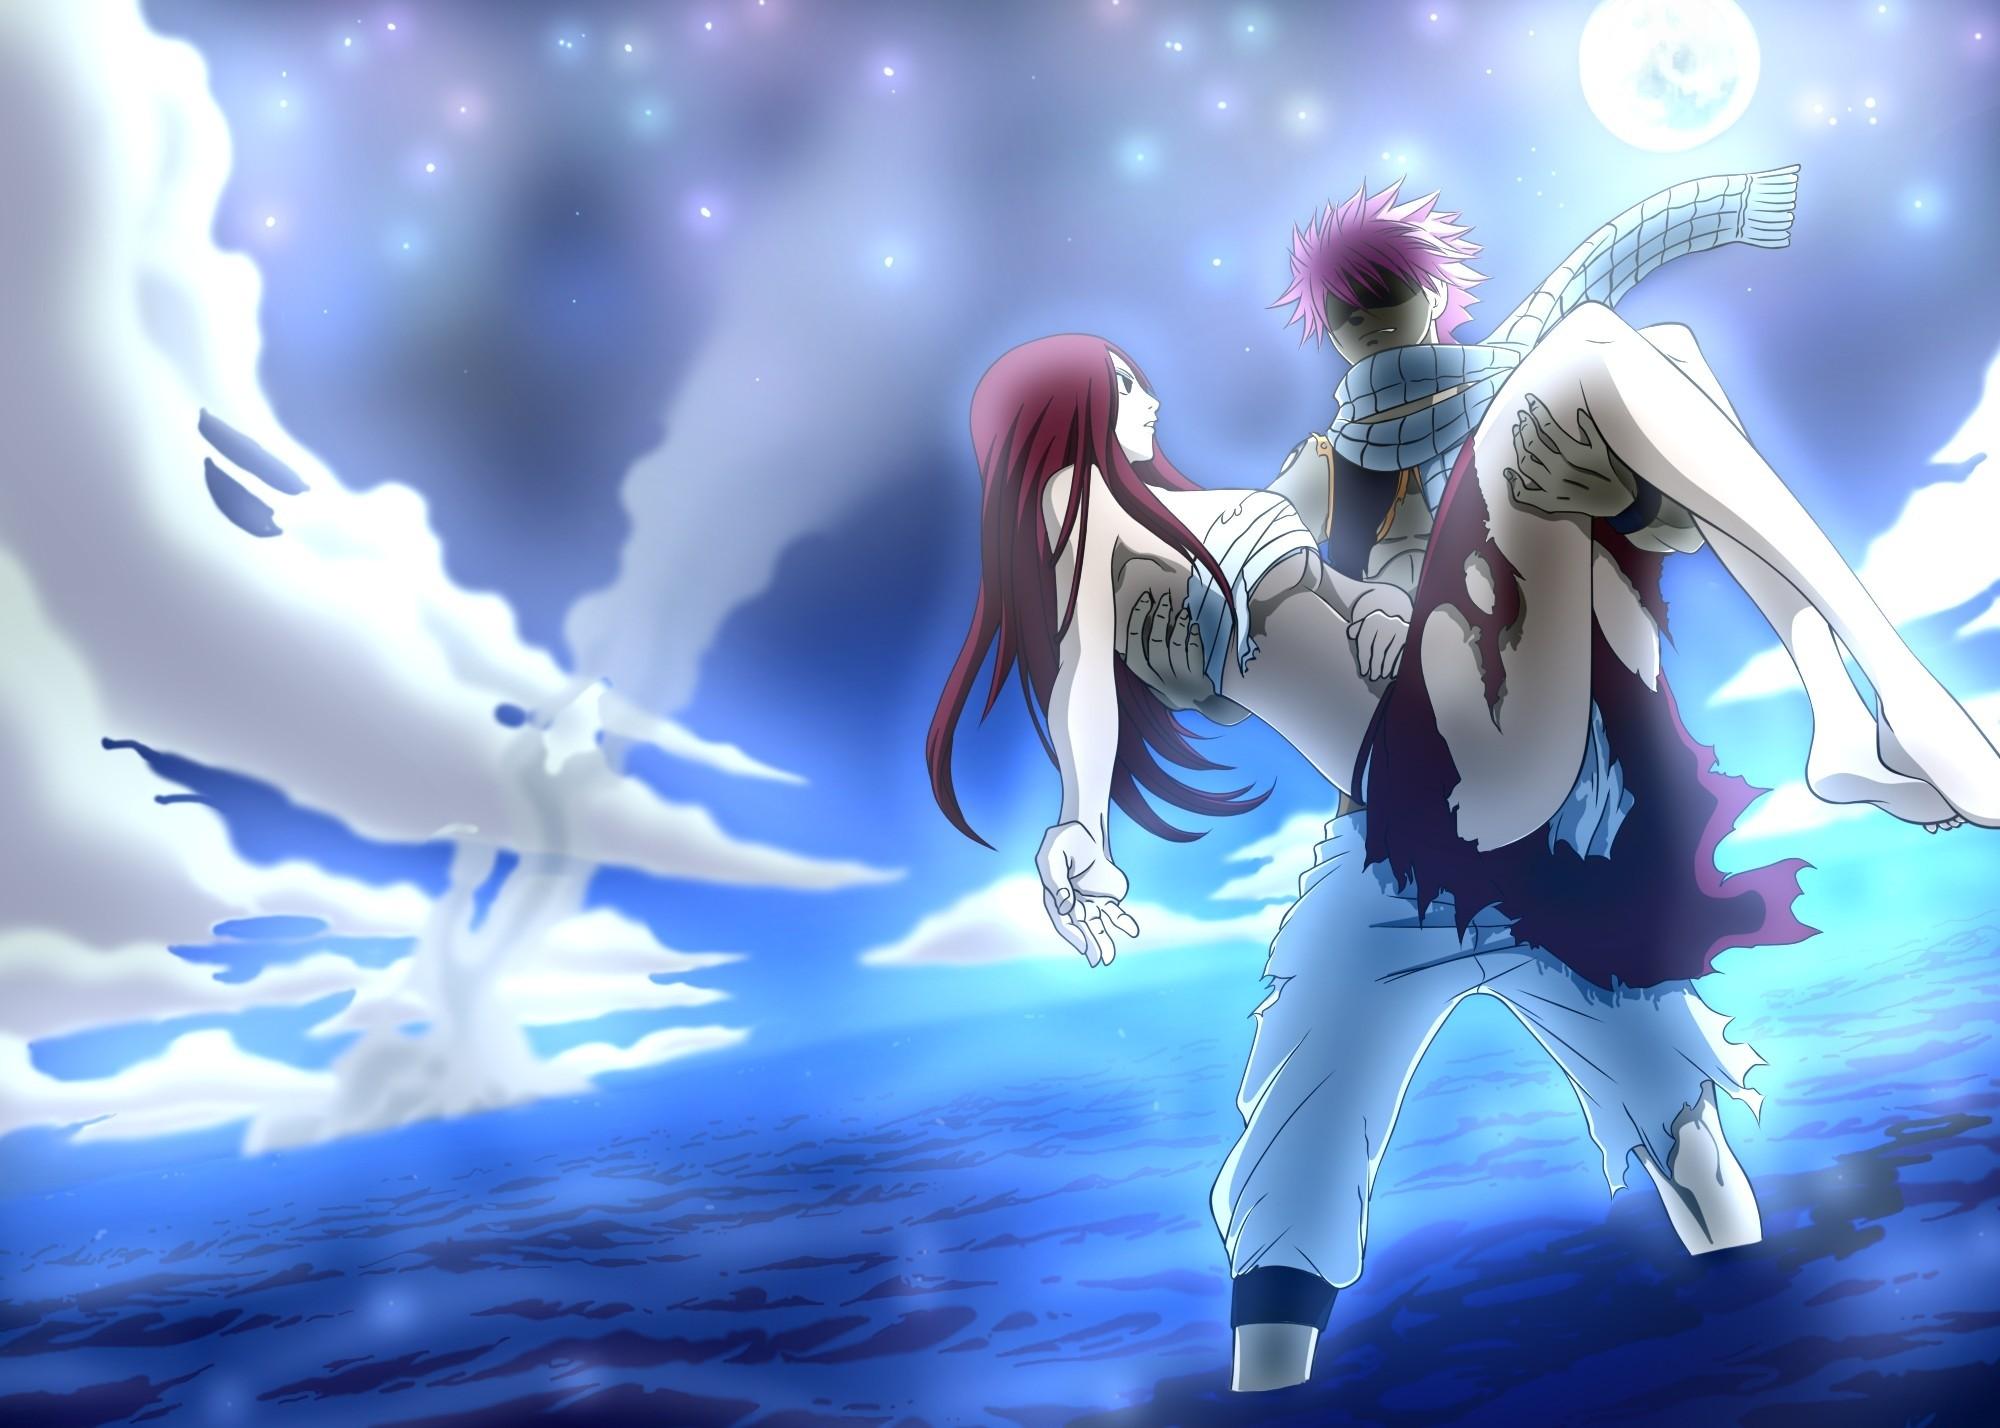 Fairy Tail Wallpaper 2000x1428 Fairy Tail Anime Anime Girls 2000x1428